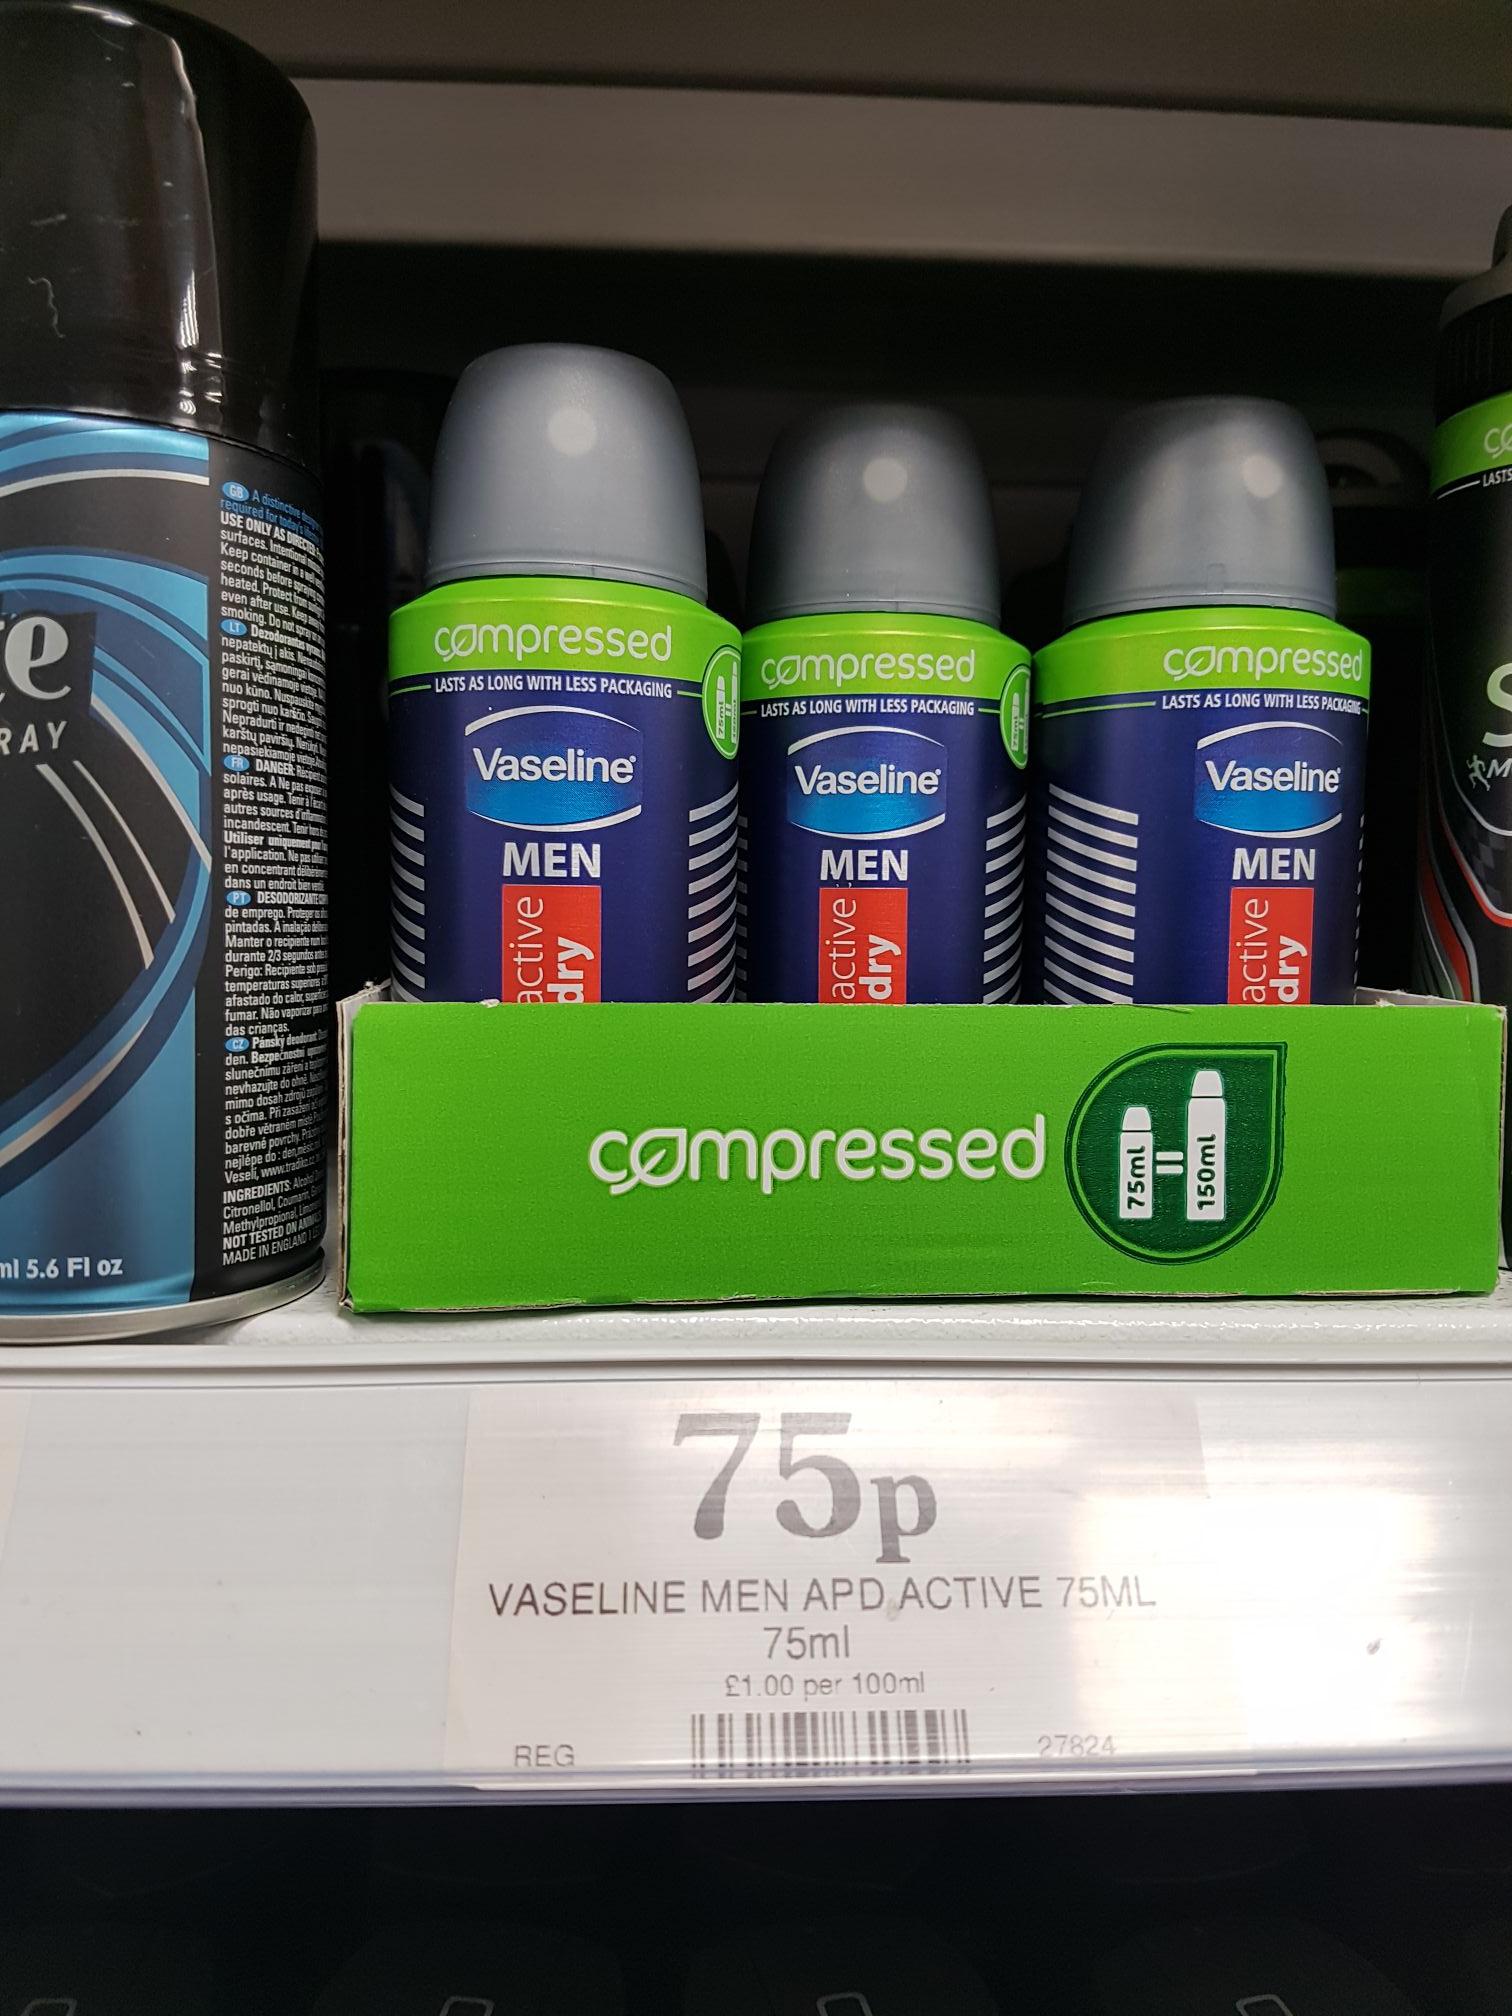 Vaseline men deodorant 75p @ Home bargains